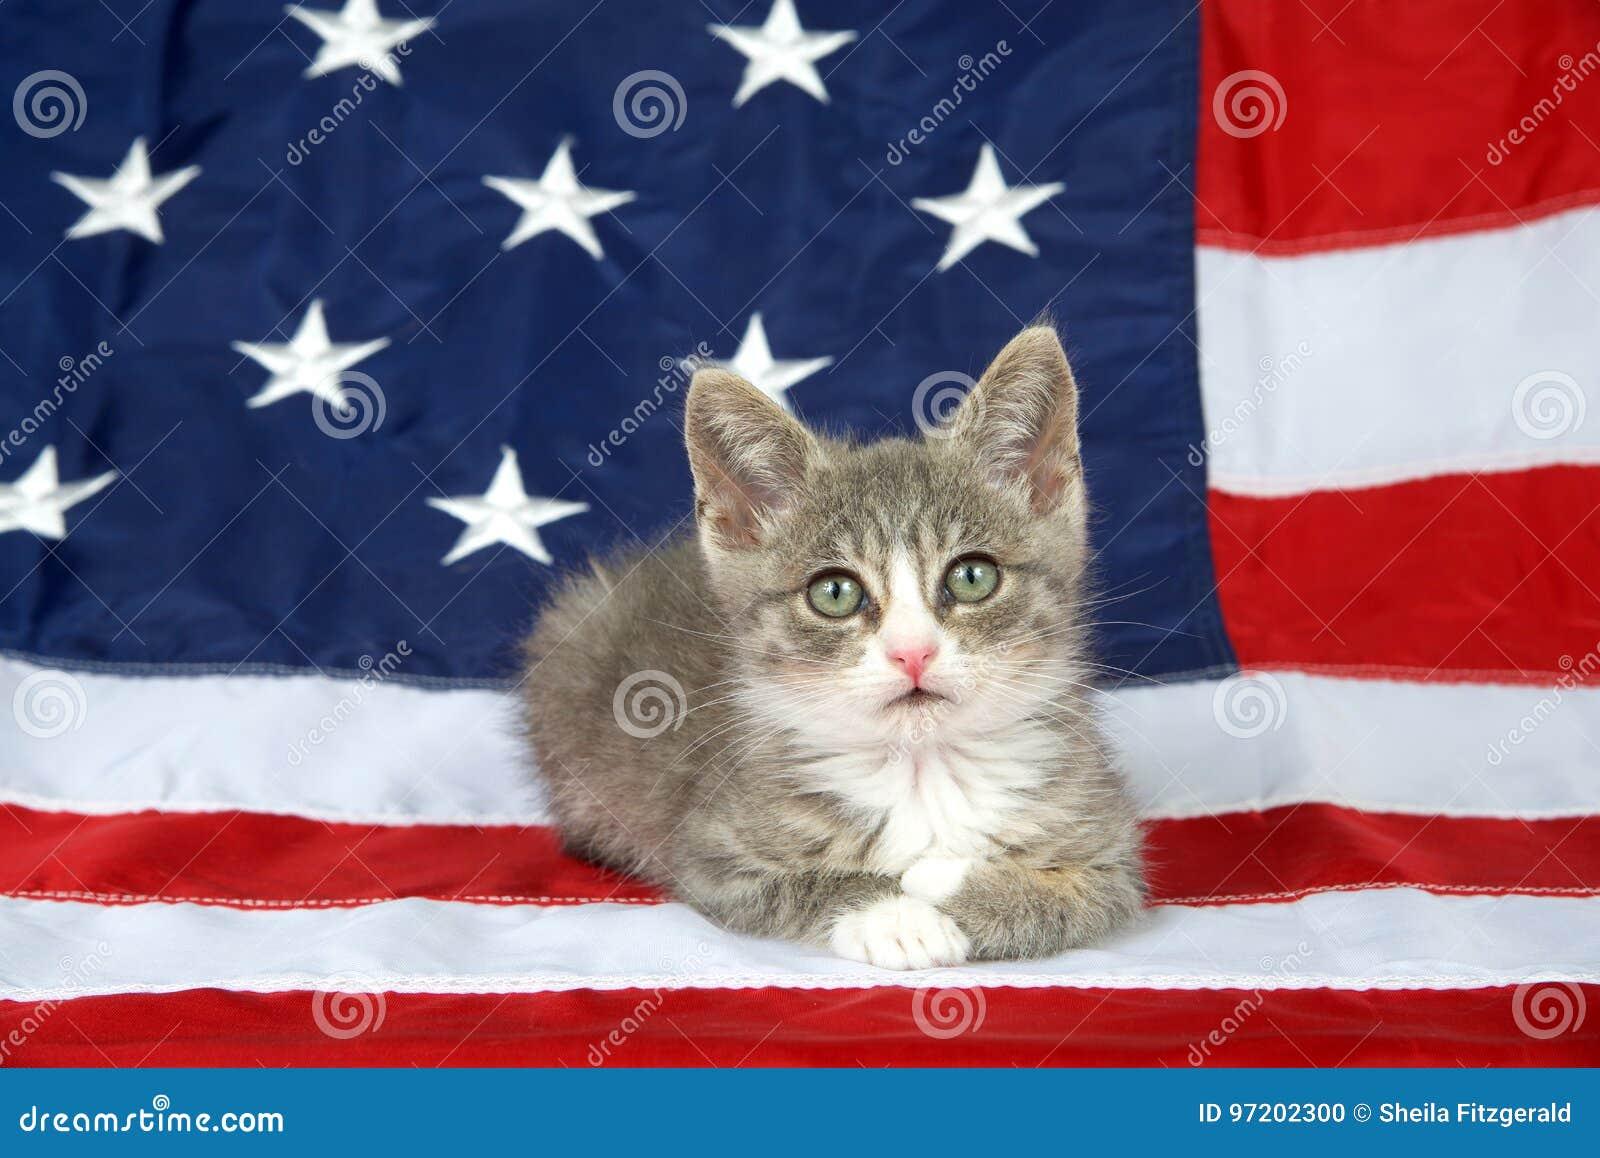 Patriotic tabby kitten on American flag